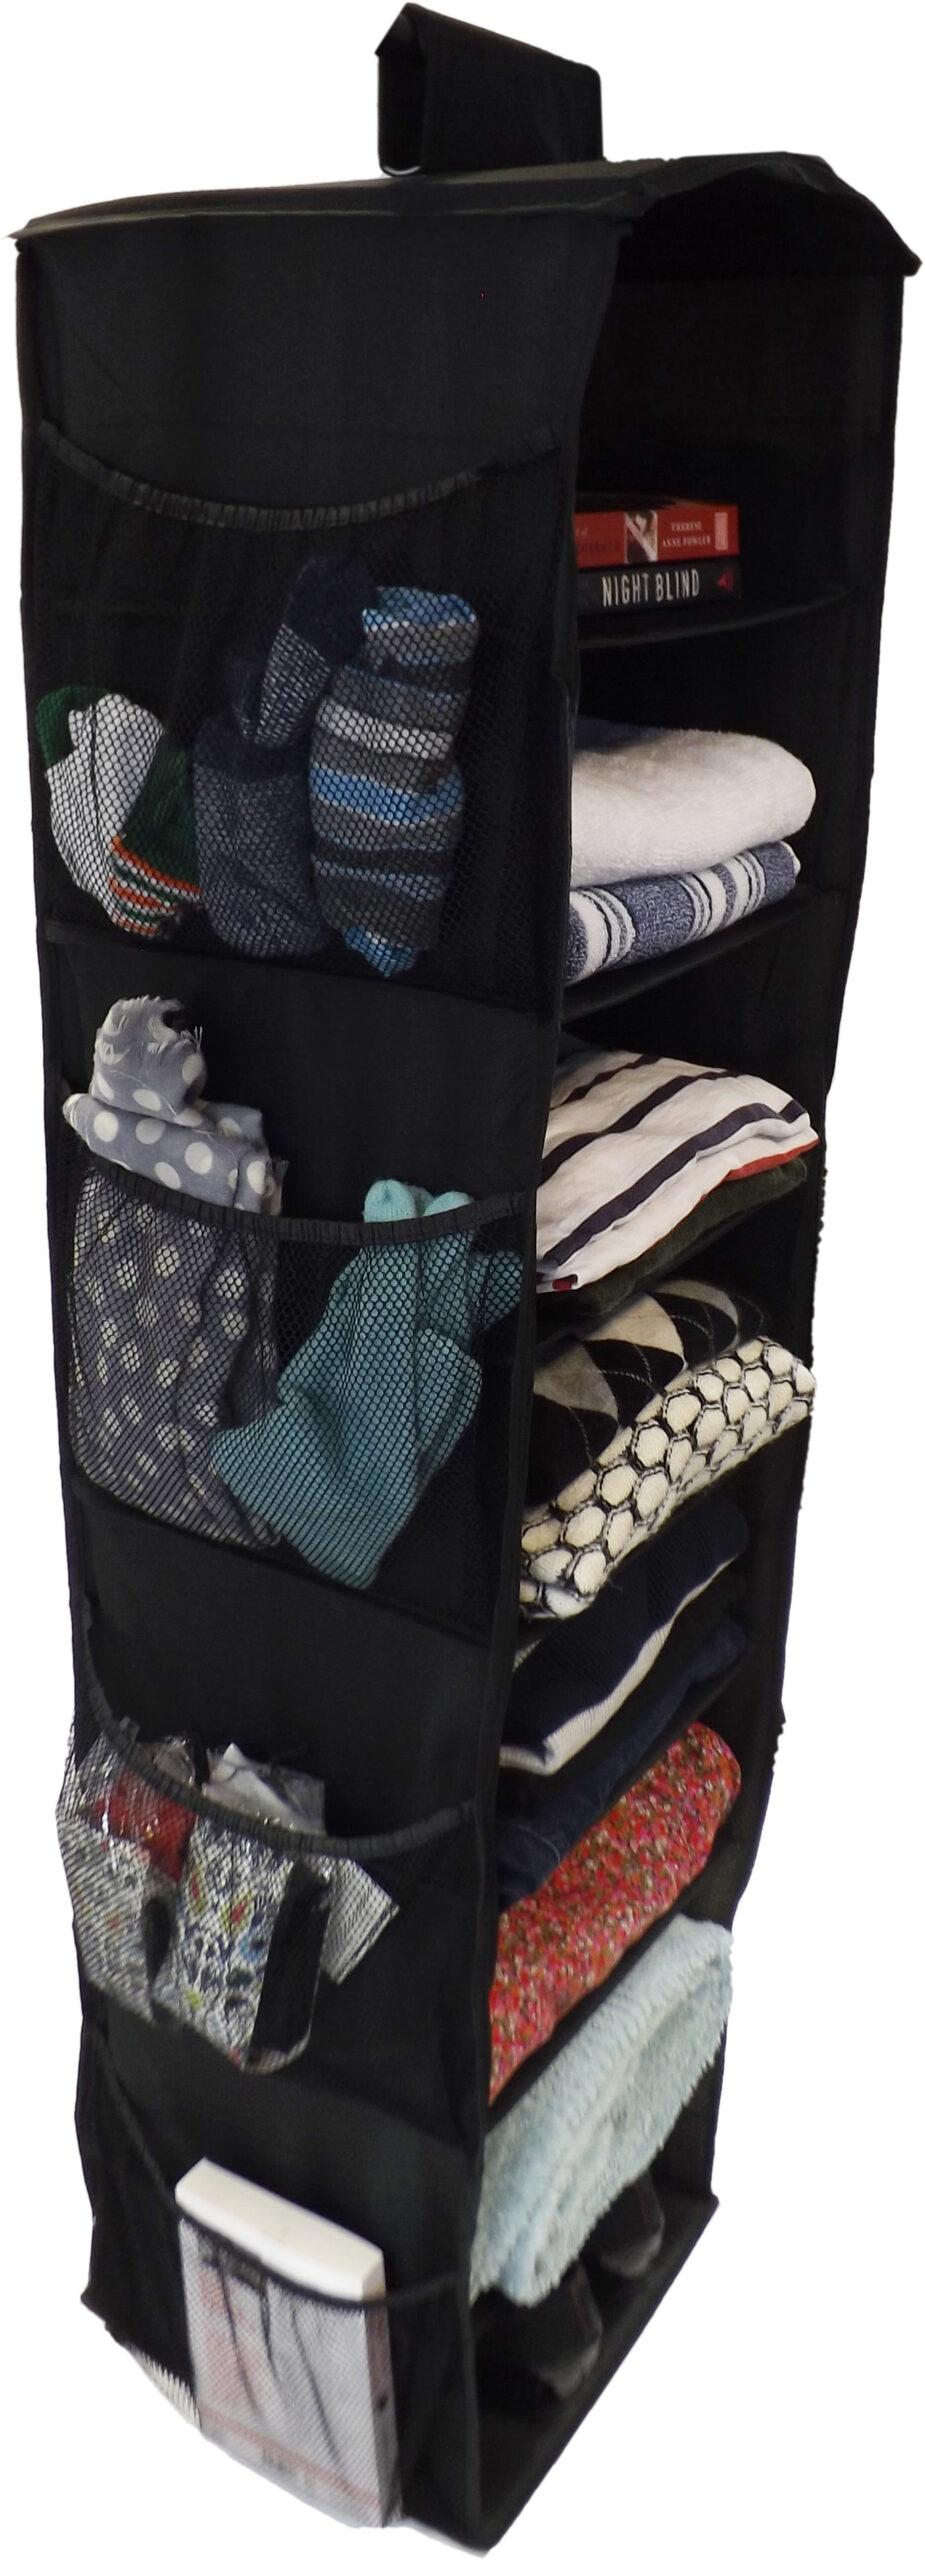 Hanging Wardrobe Organiser, Heavy Duty, 8 Shelves, 125x30x30cm, Black